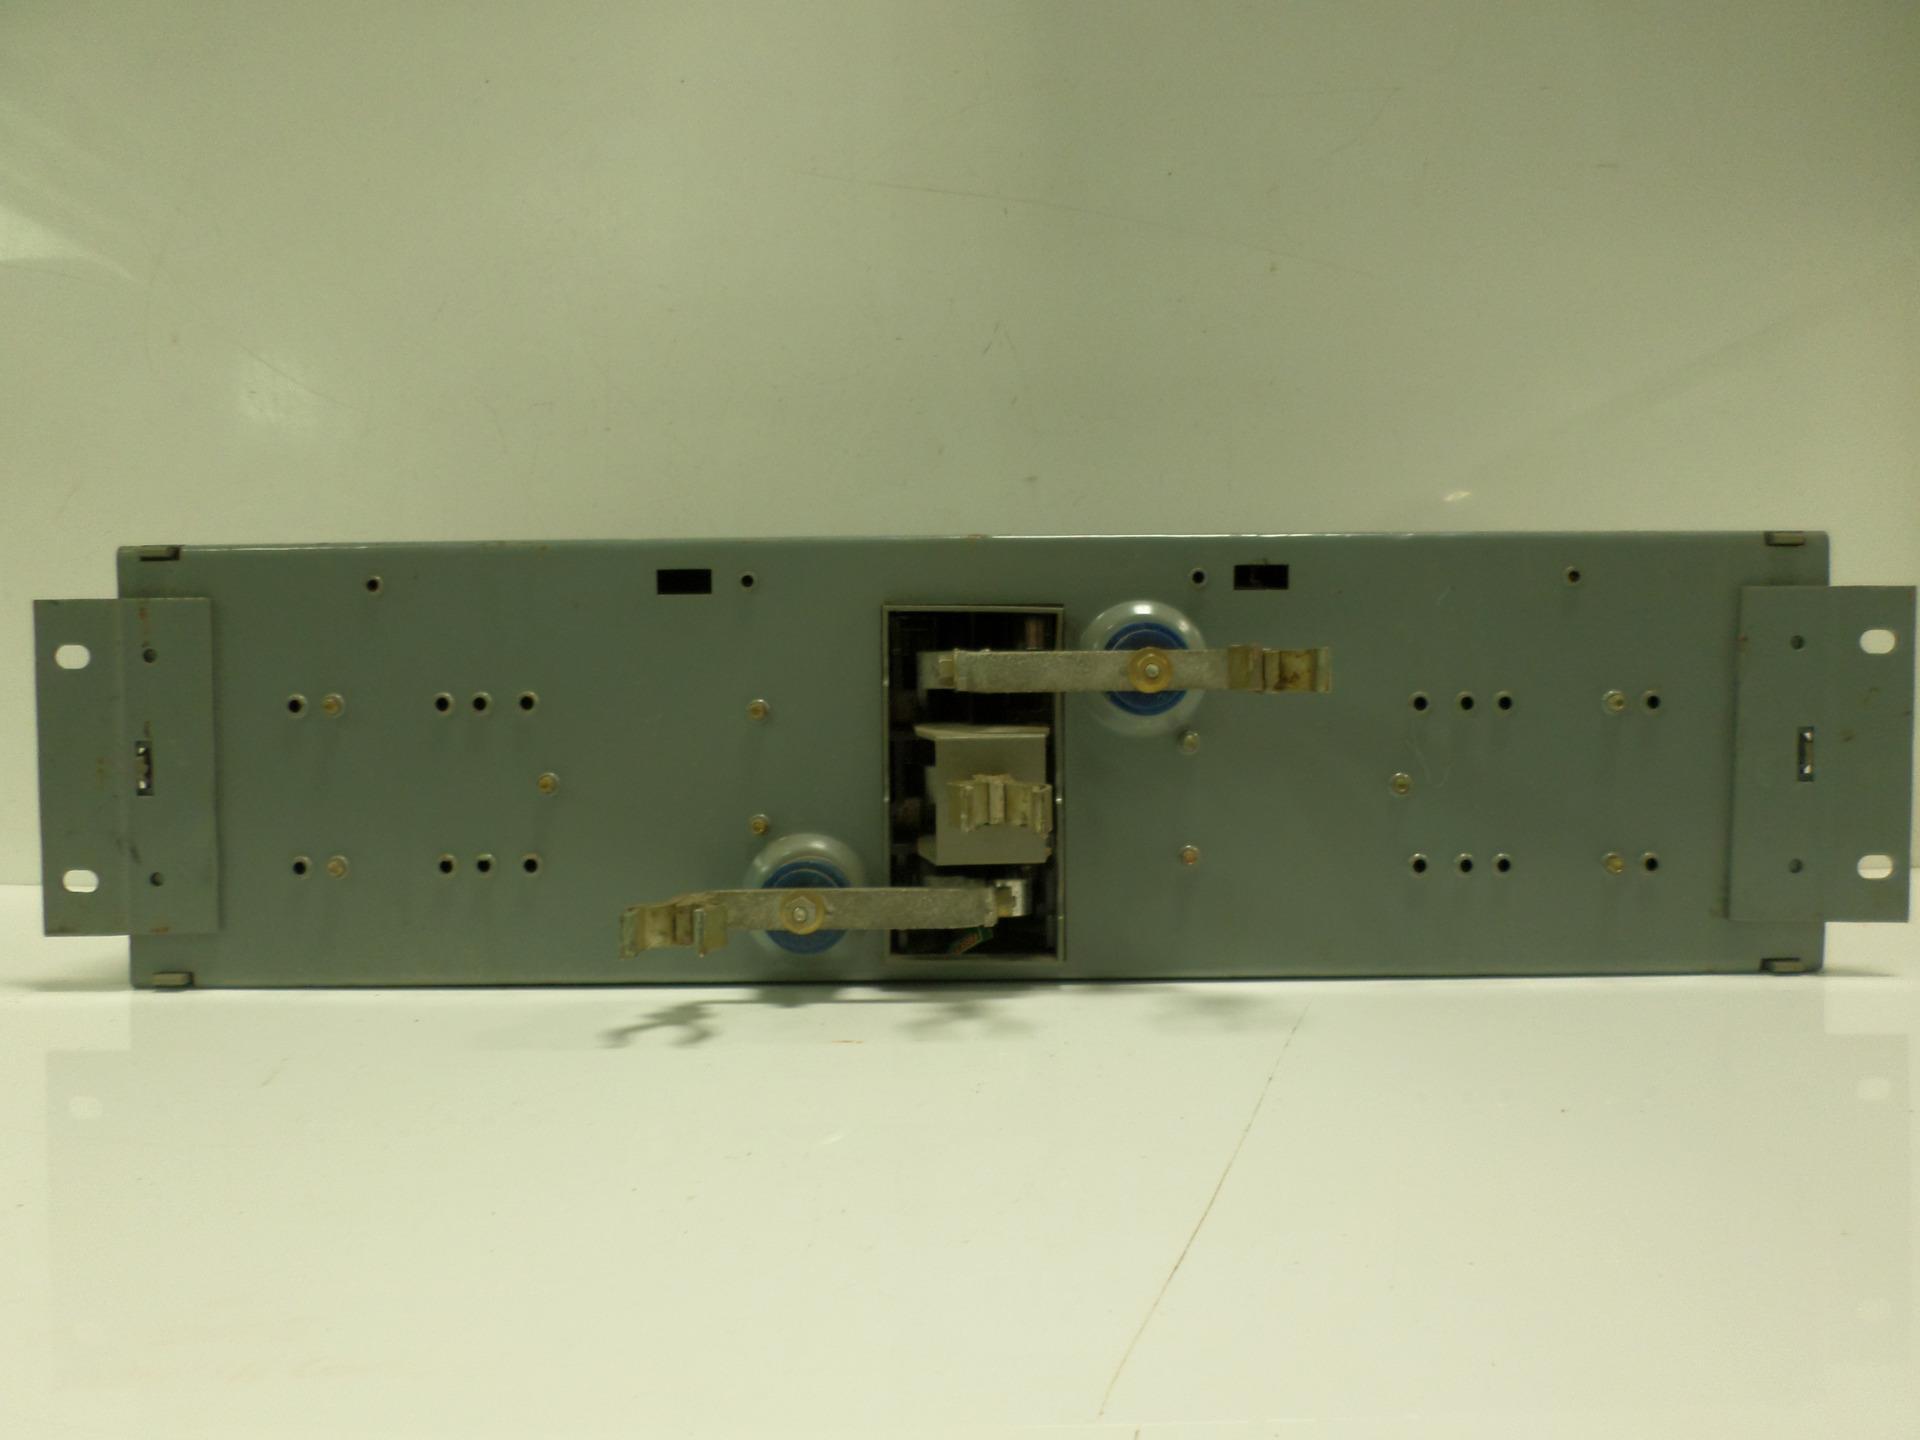 Square D 100 Amp Fuse Box on